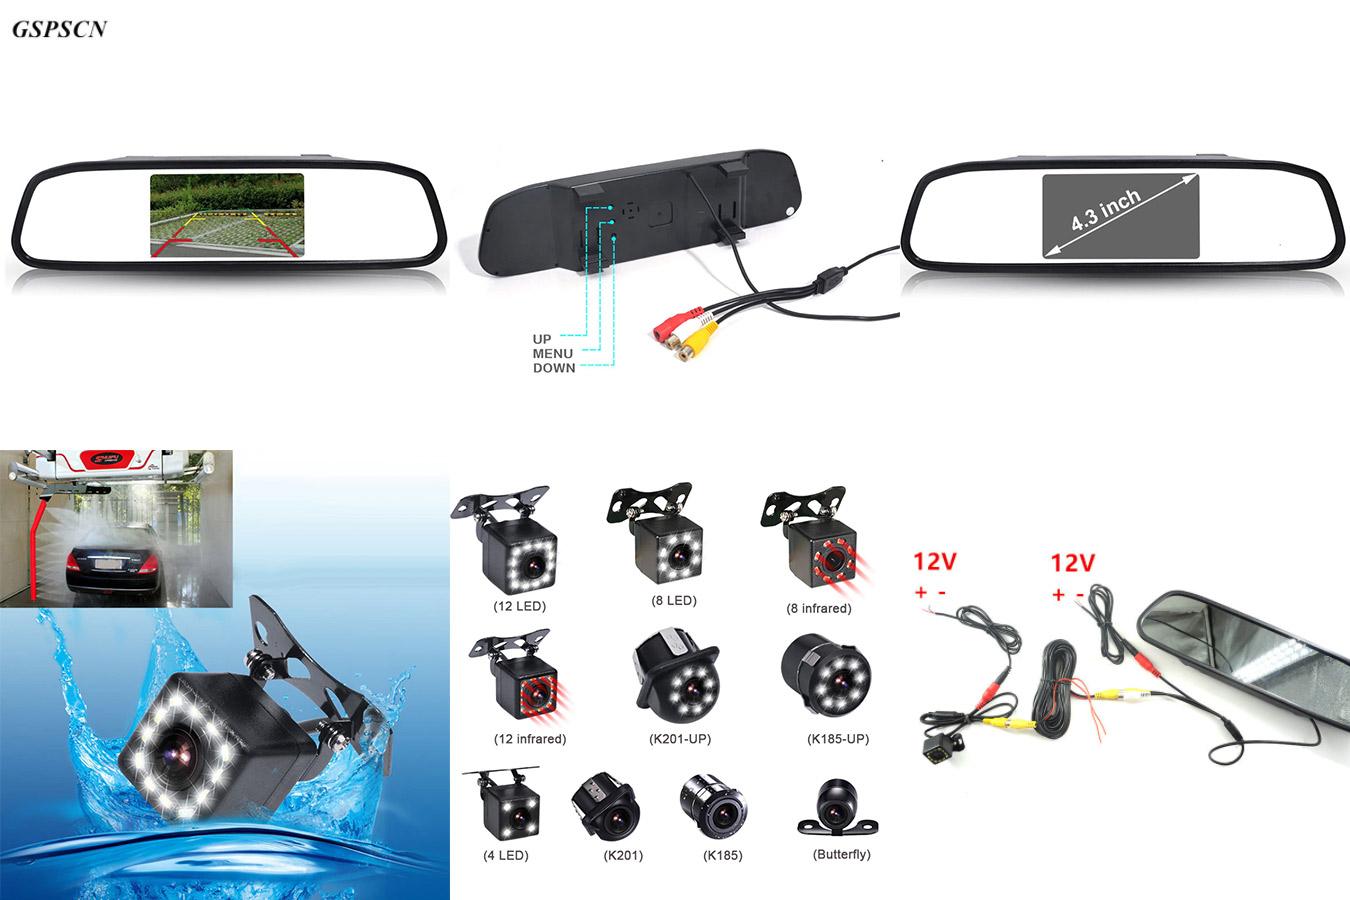 Монитор с камерой в комплекте